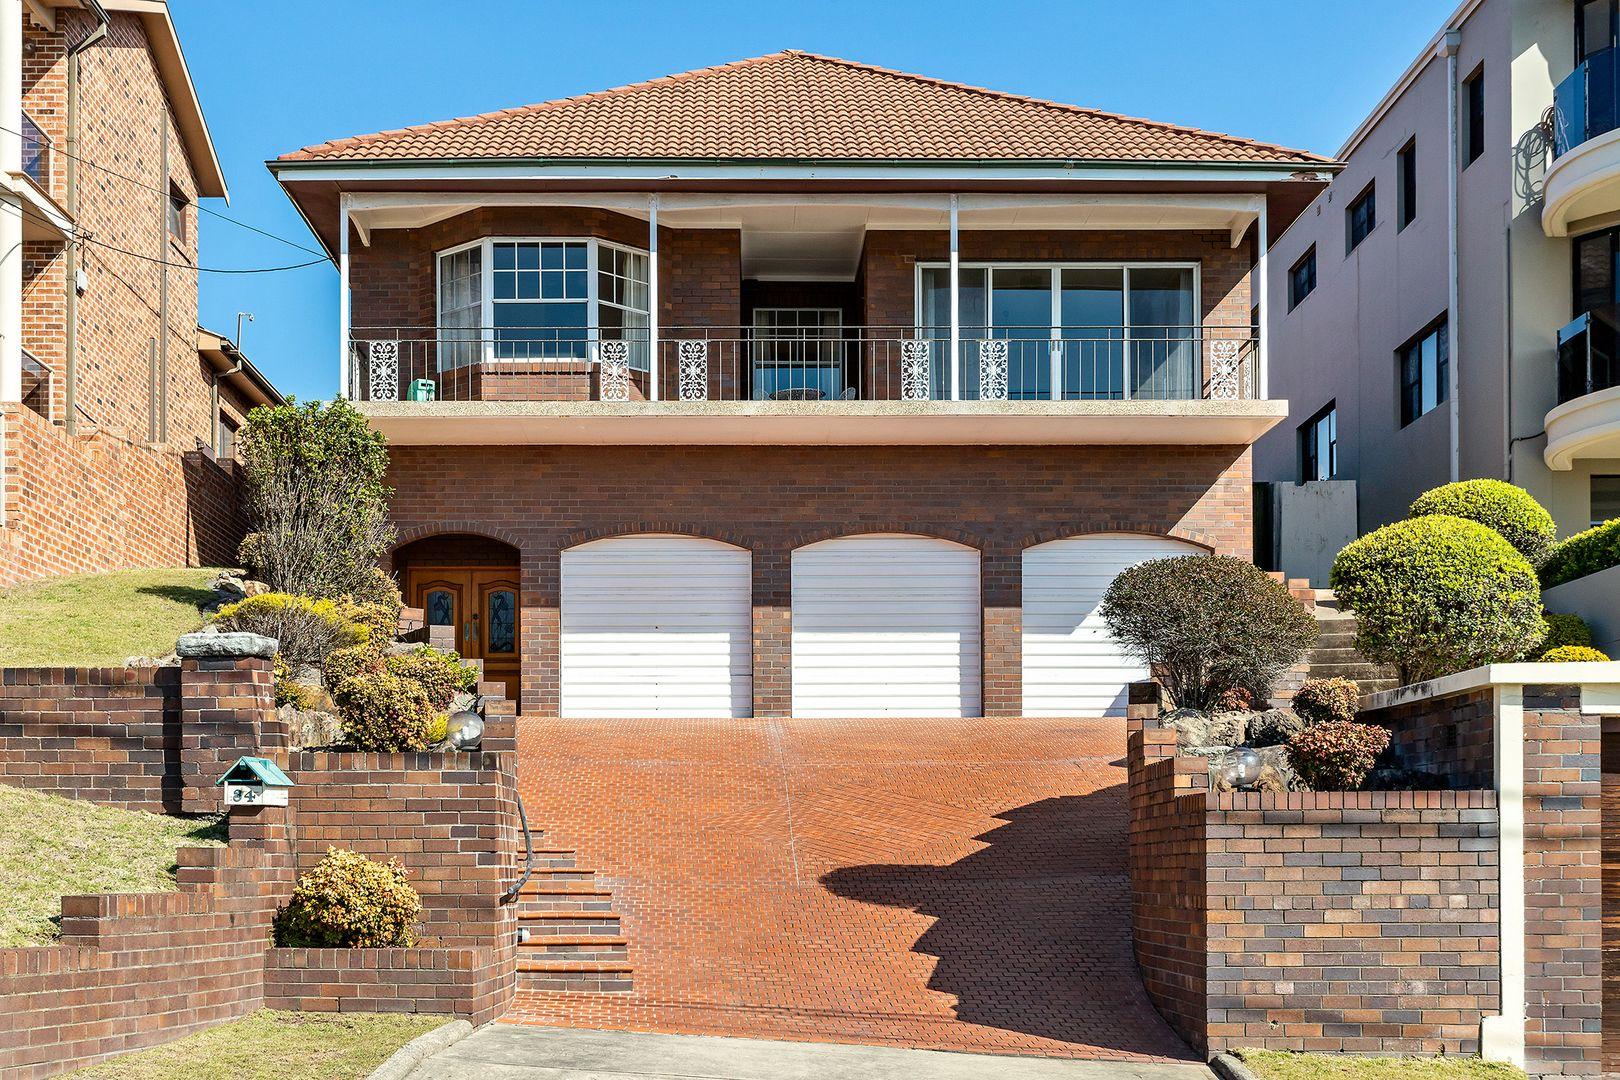 34 Mermaid Avenue, Maroubra NSW 2035, Image 0